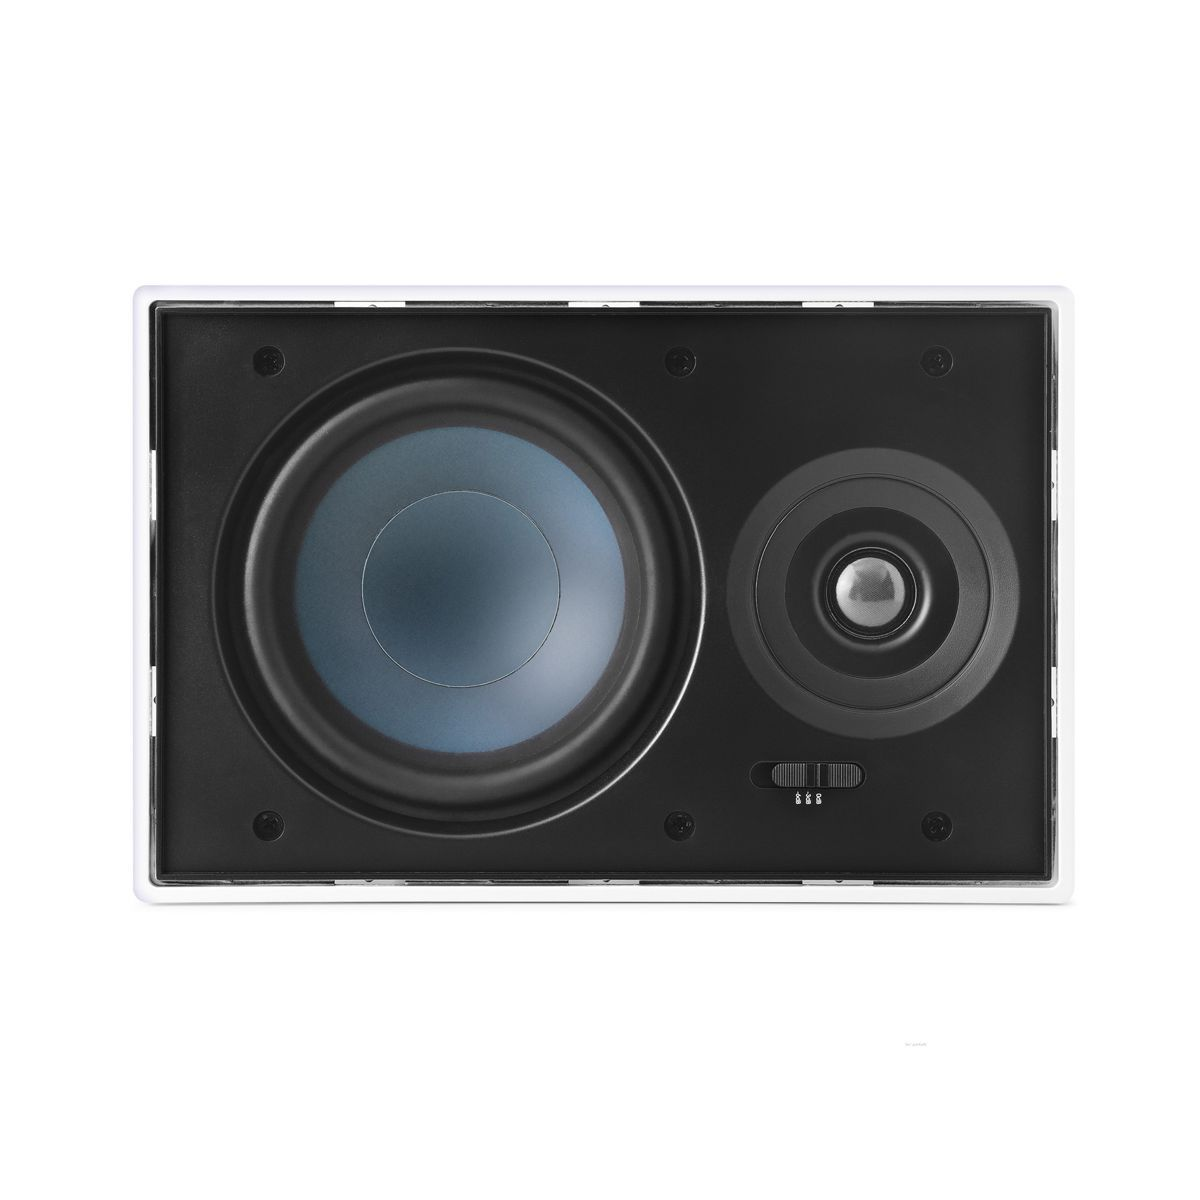 Kit Som Ambiente C/ Amplificador Bluetooth BTA-1 + 2 Caixas de Embutir LR-E100 AAT